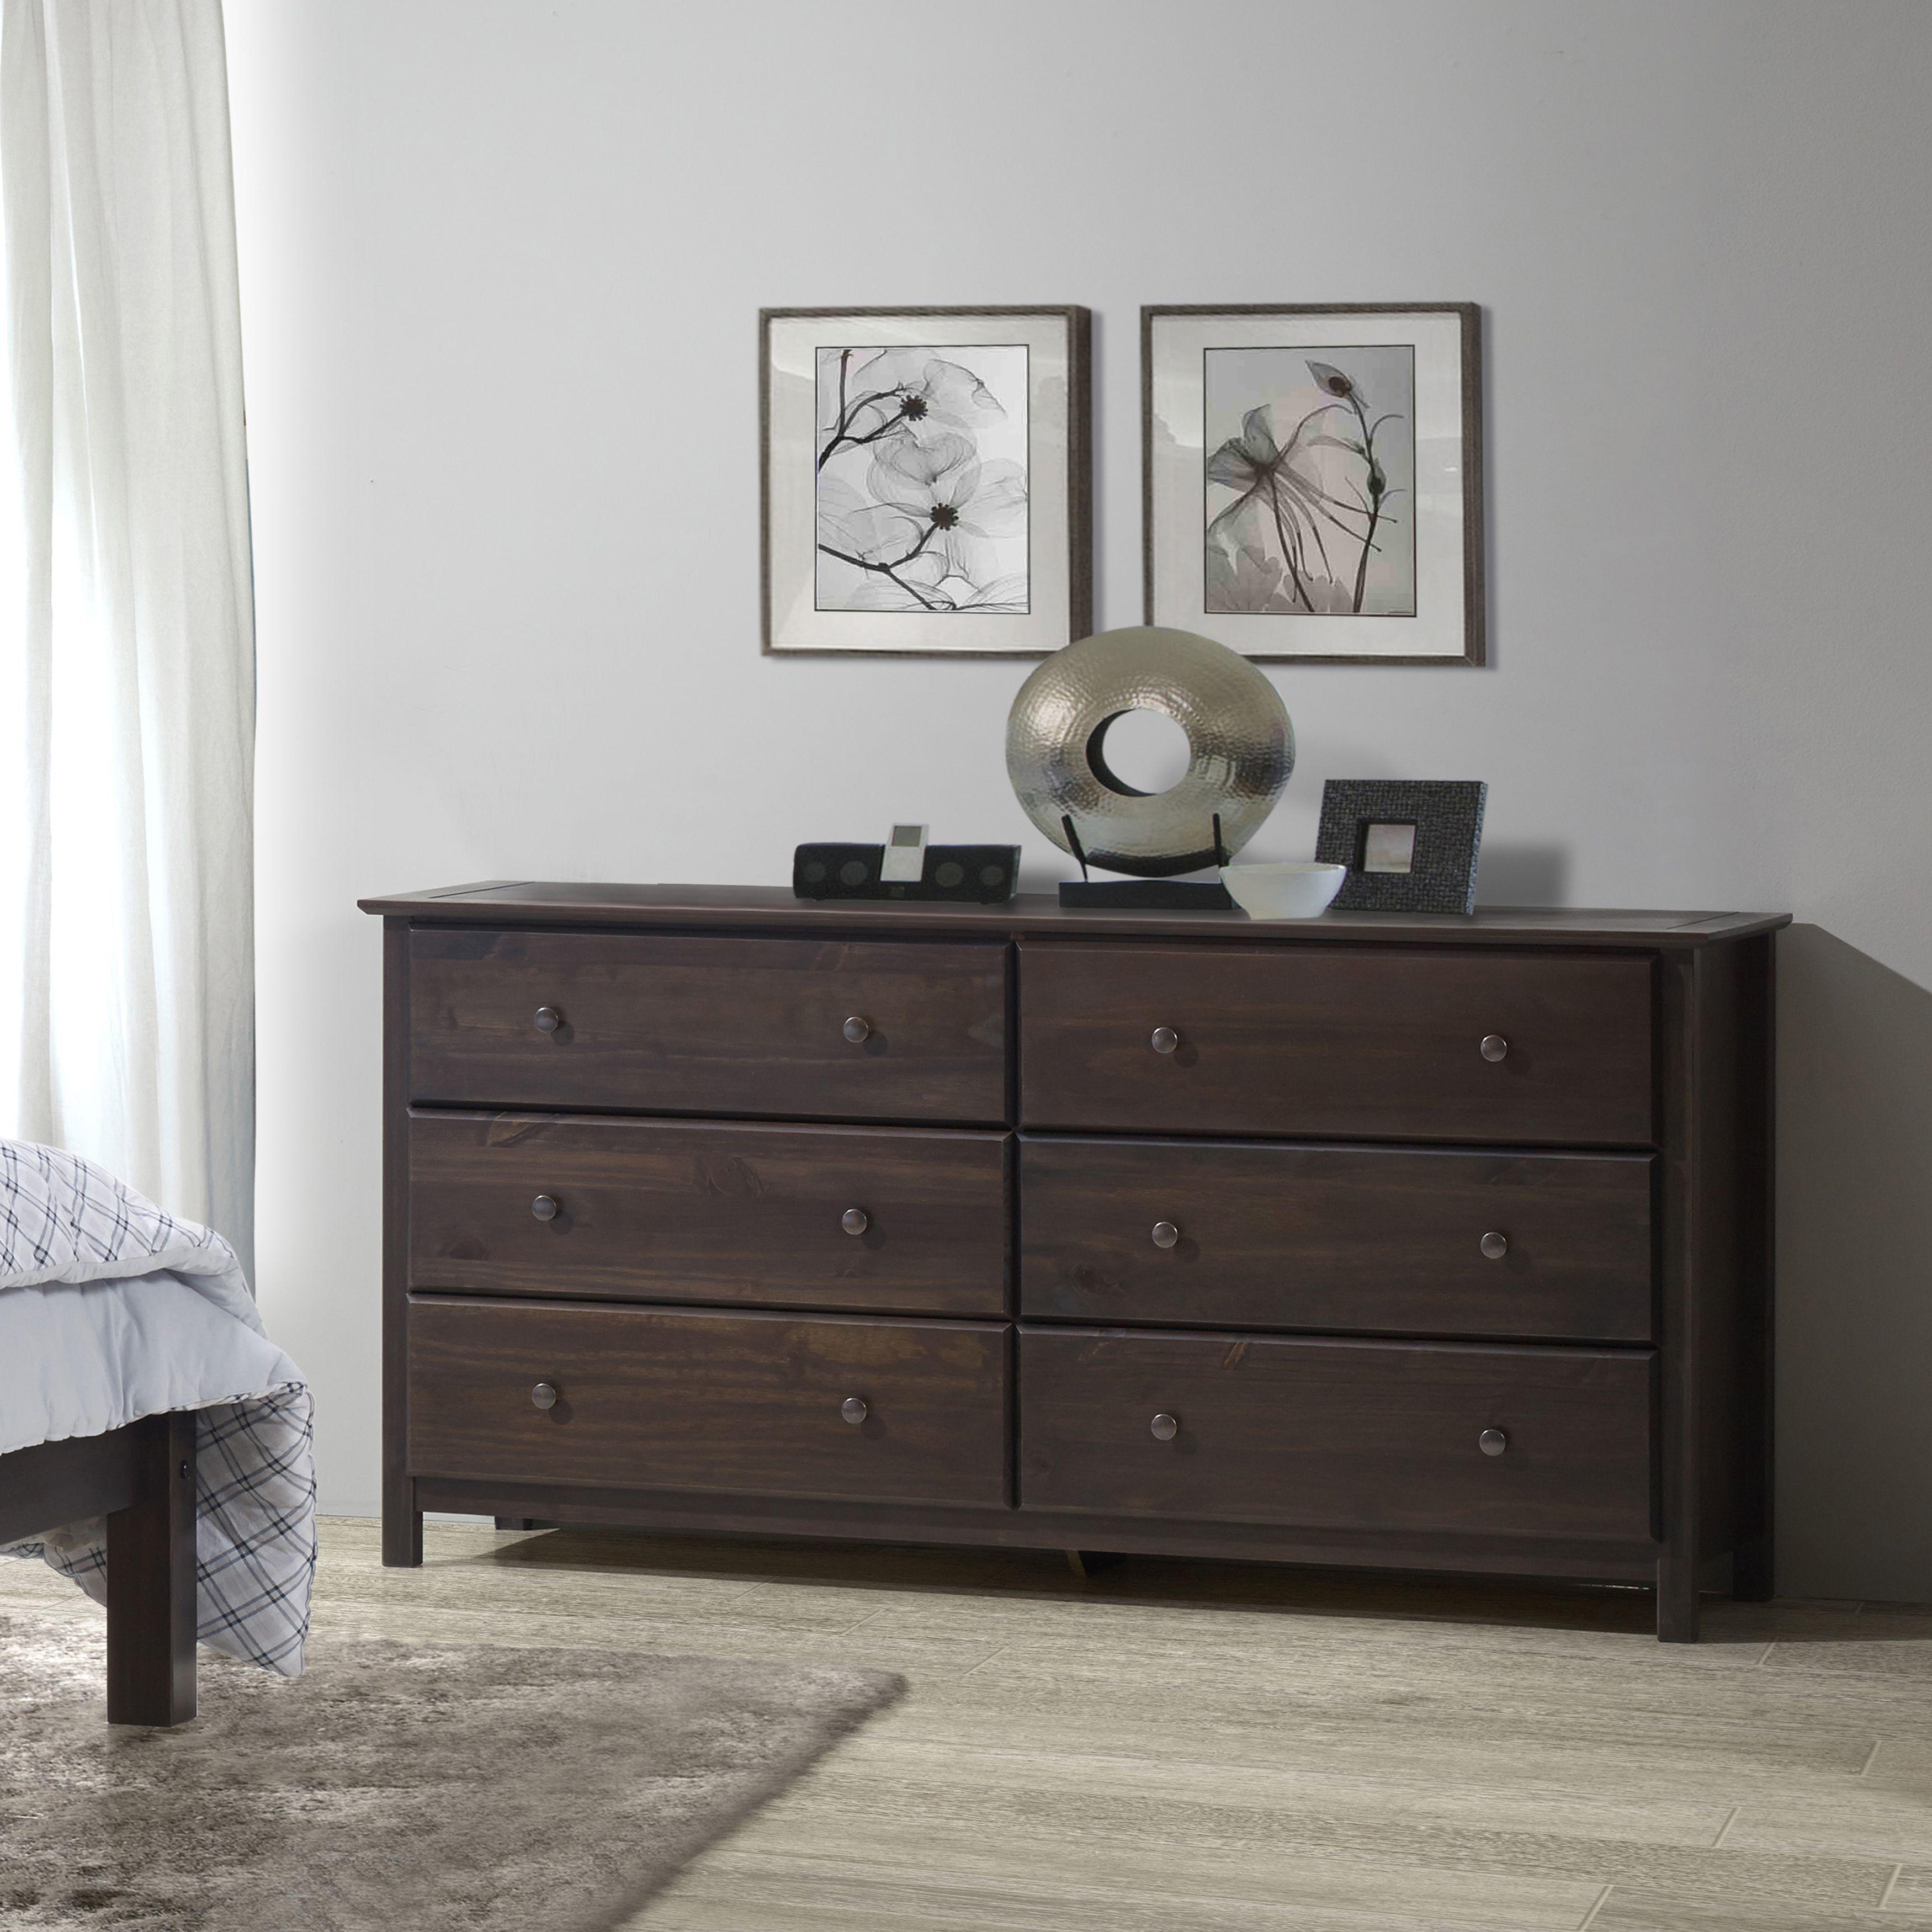 Grain wood furniture espresso finish solid pine shaker drawer